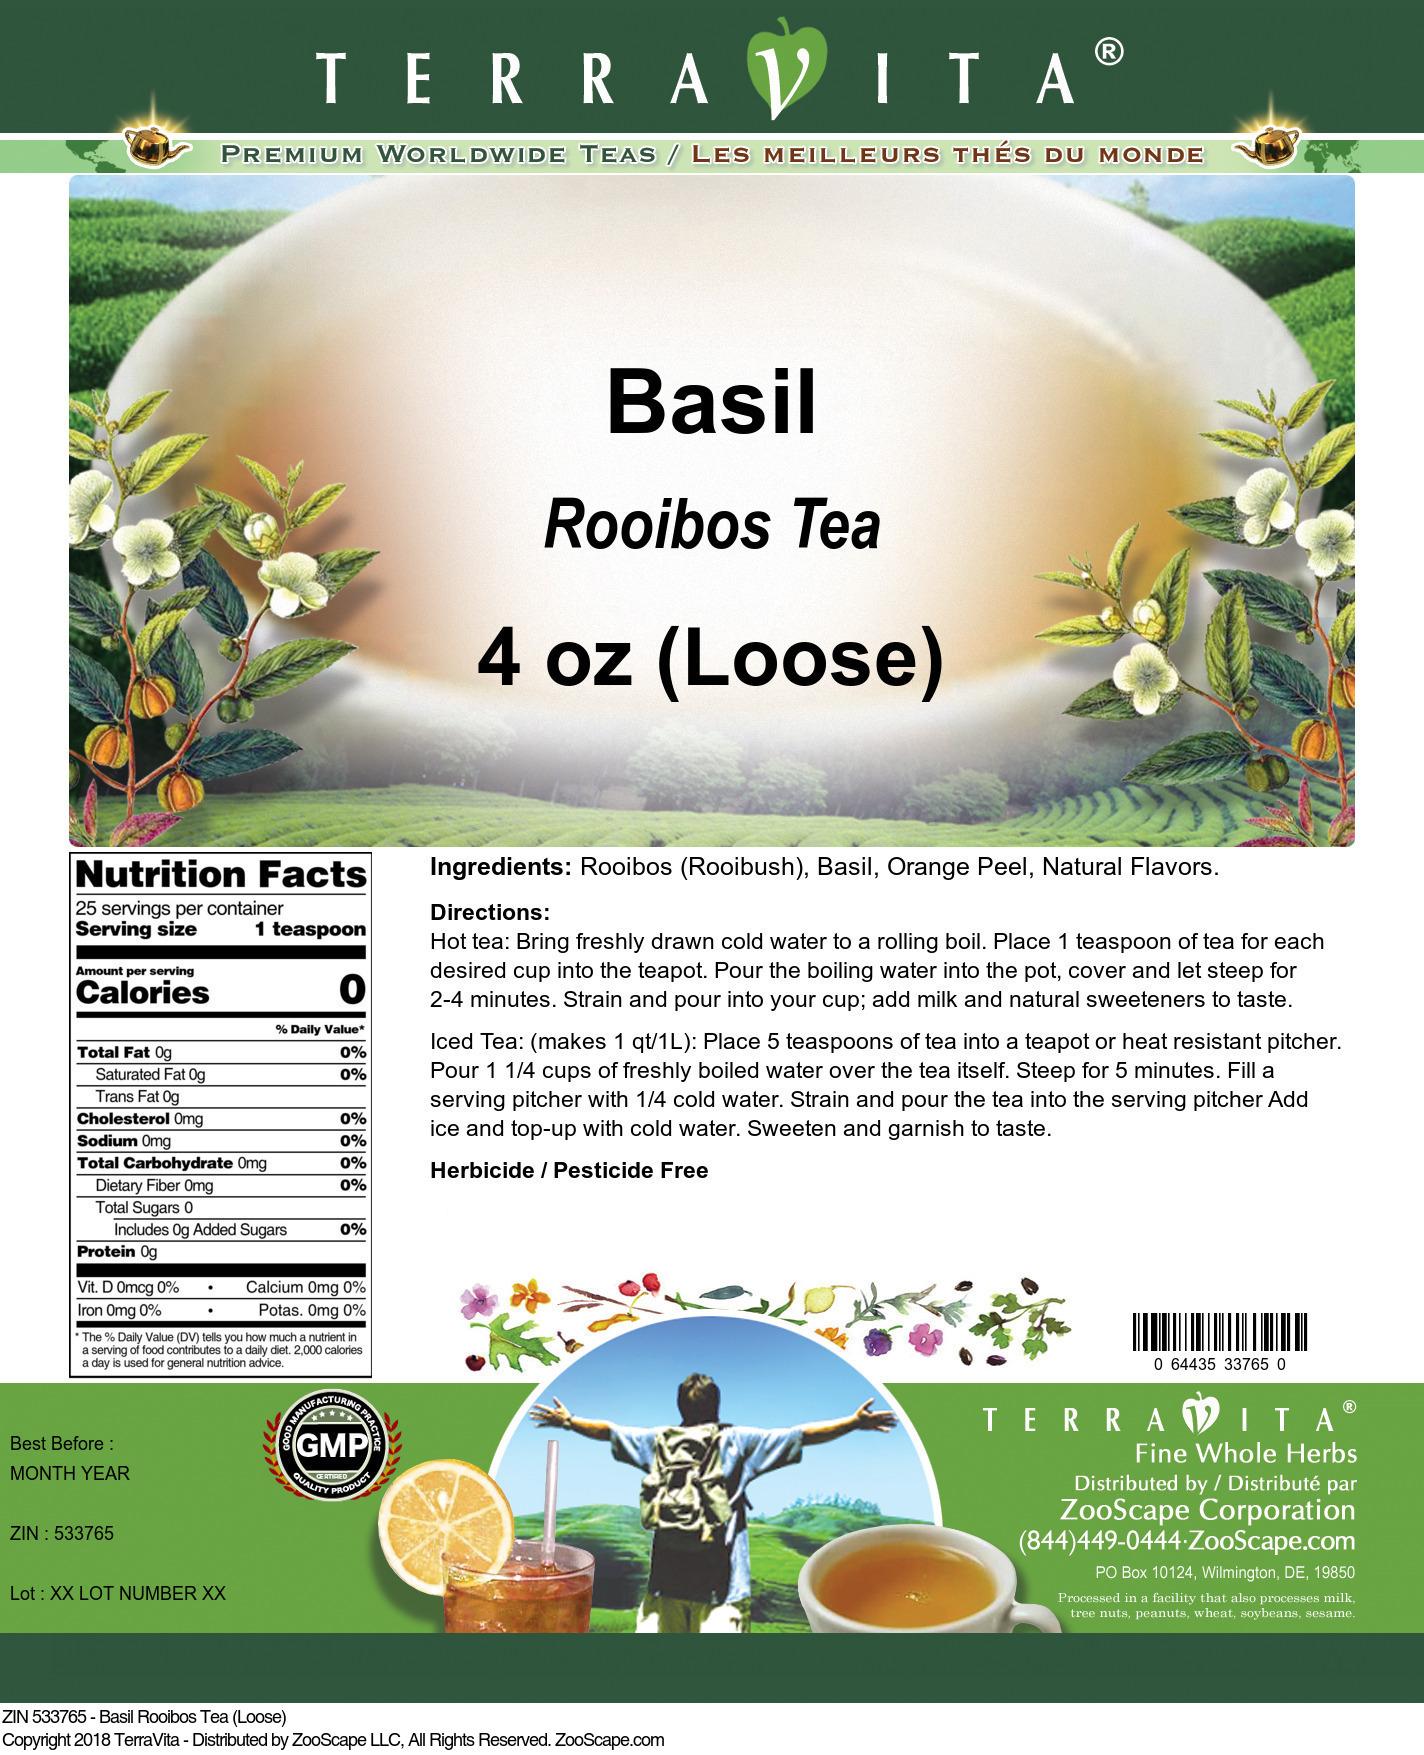 Basil Rooibos Tea